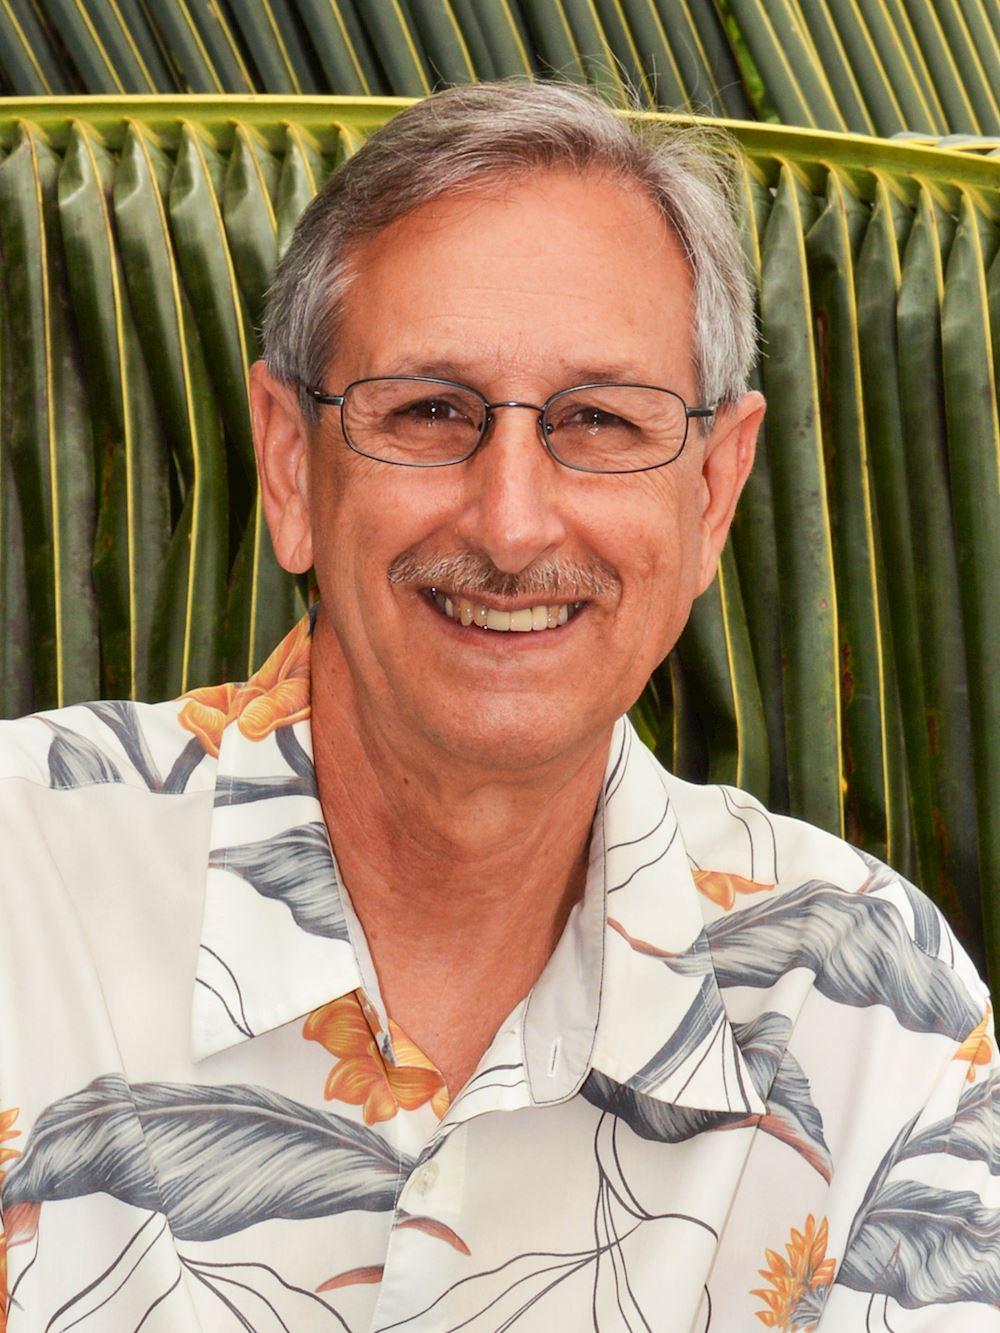 David Skeele, R(B)